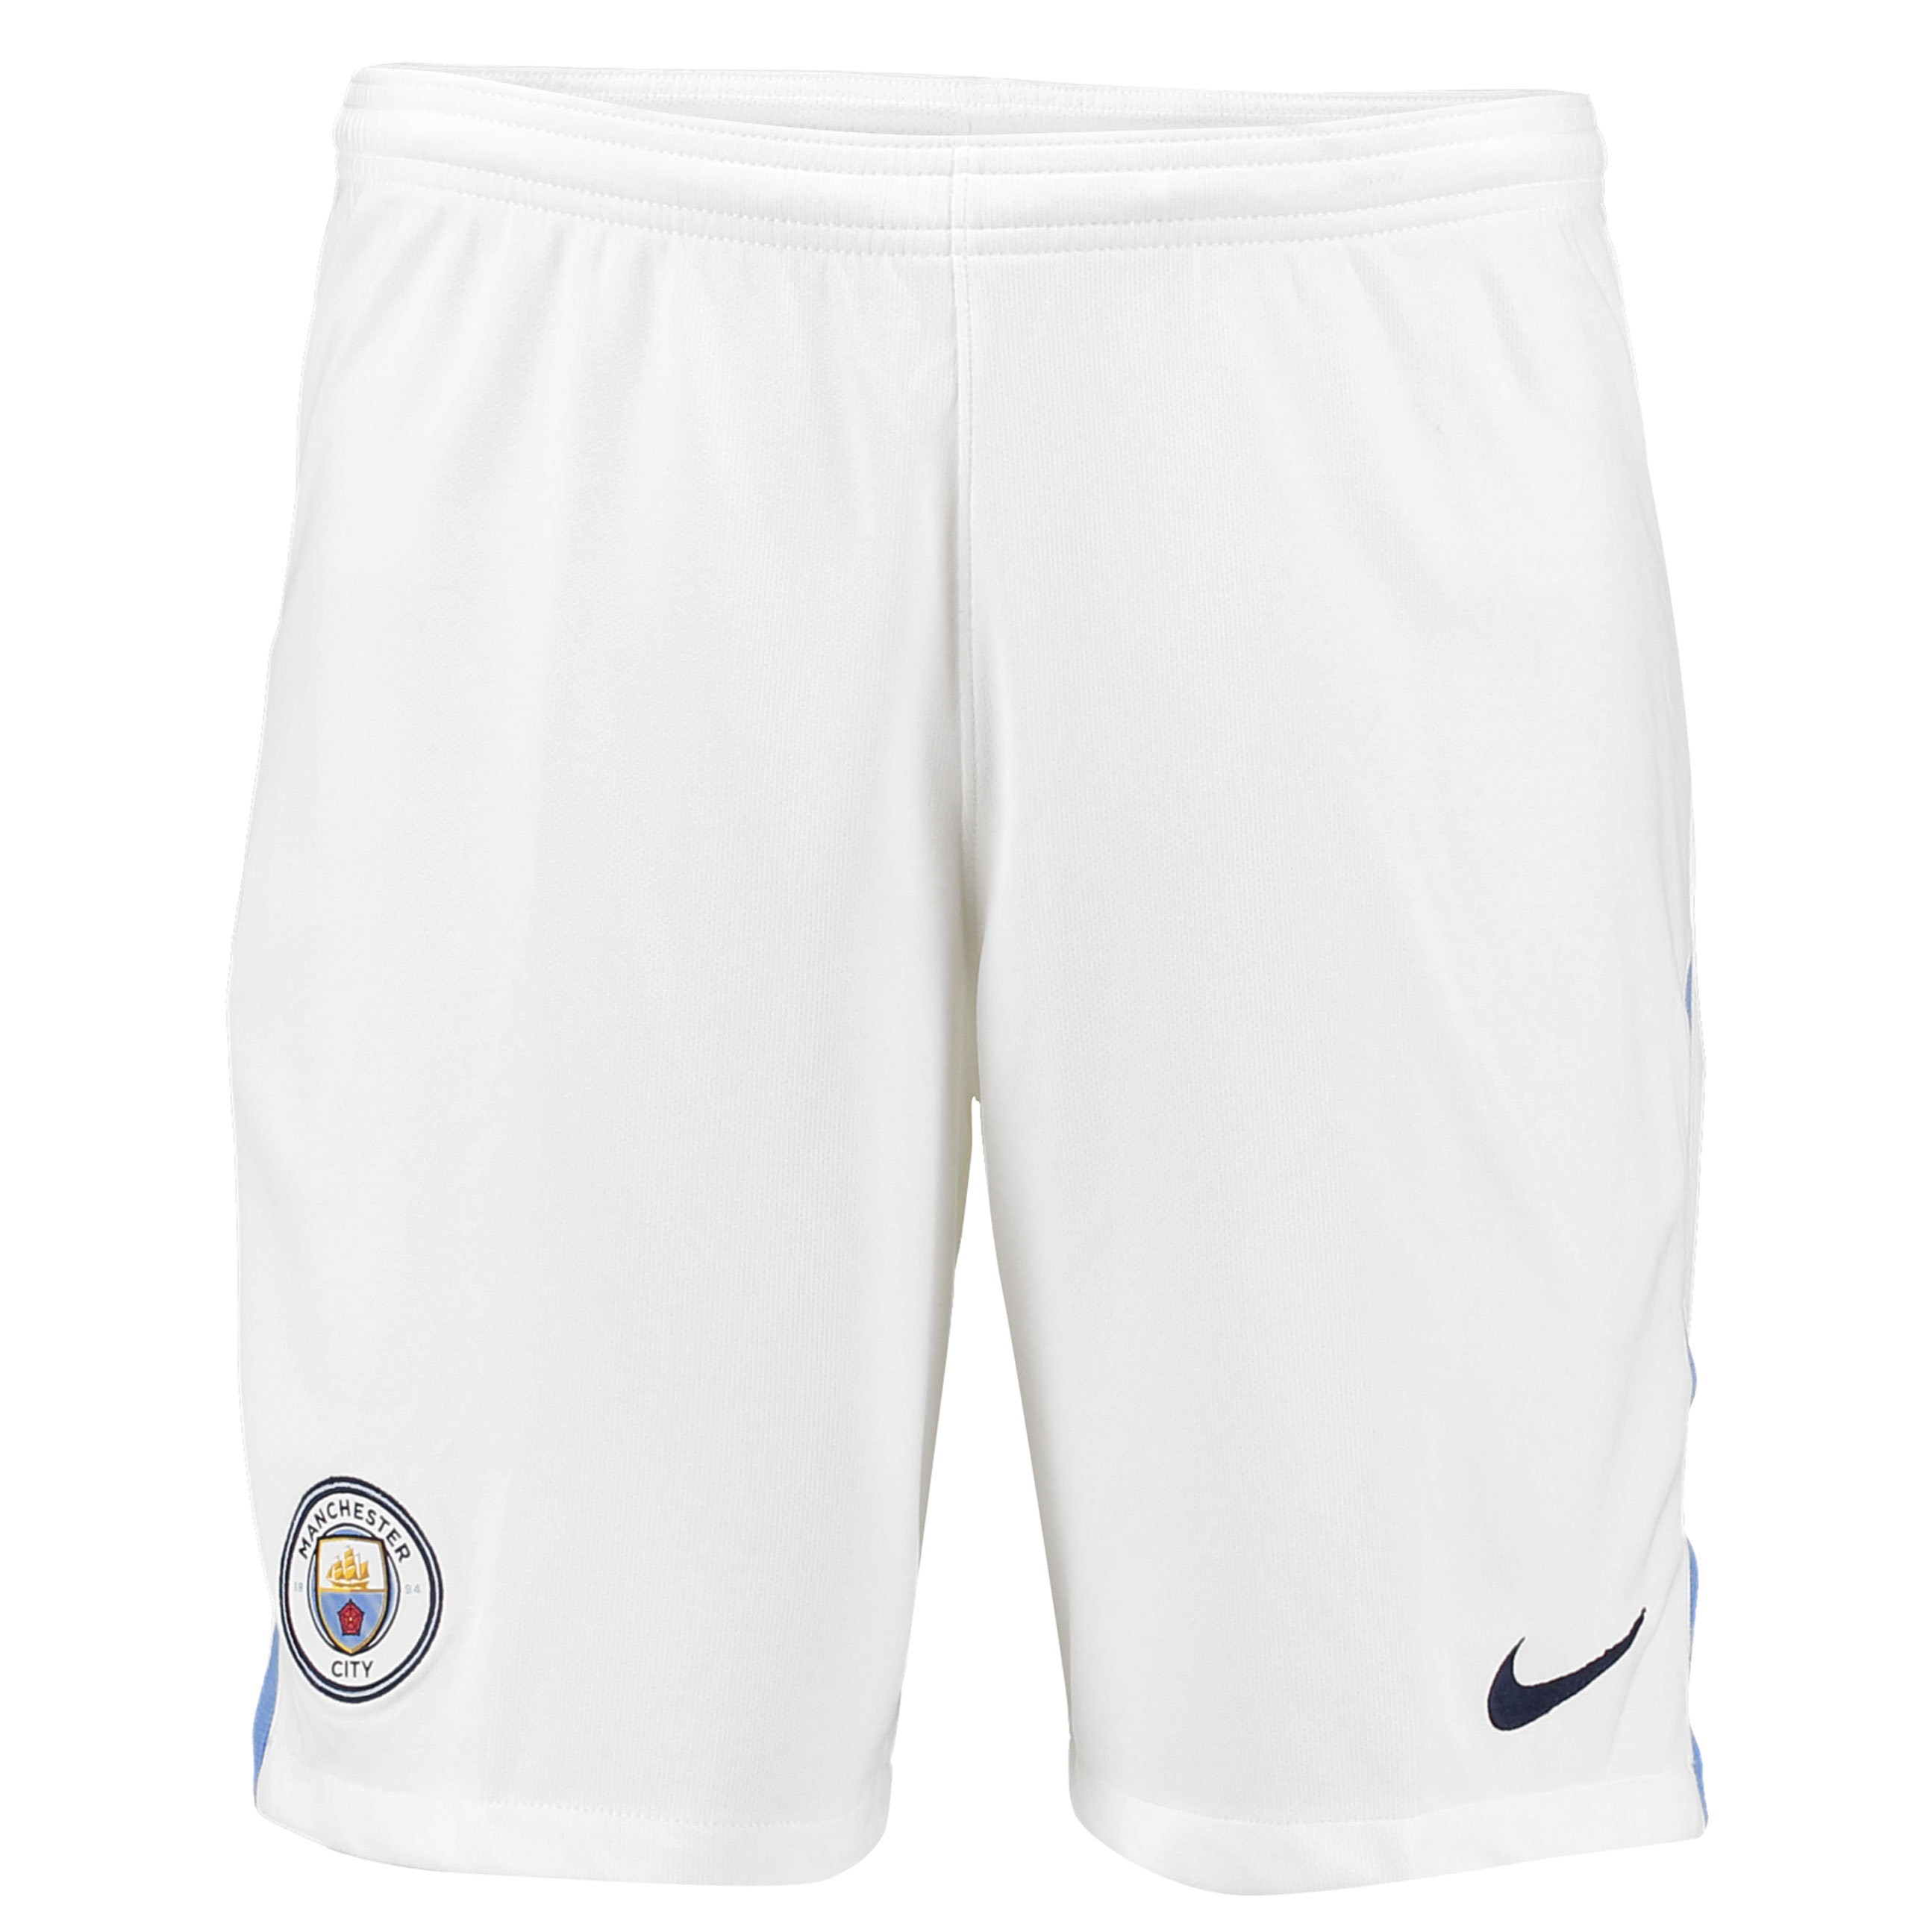 Manchester City Home Stadium Shorts 2017-18